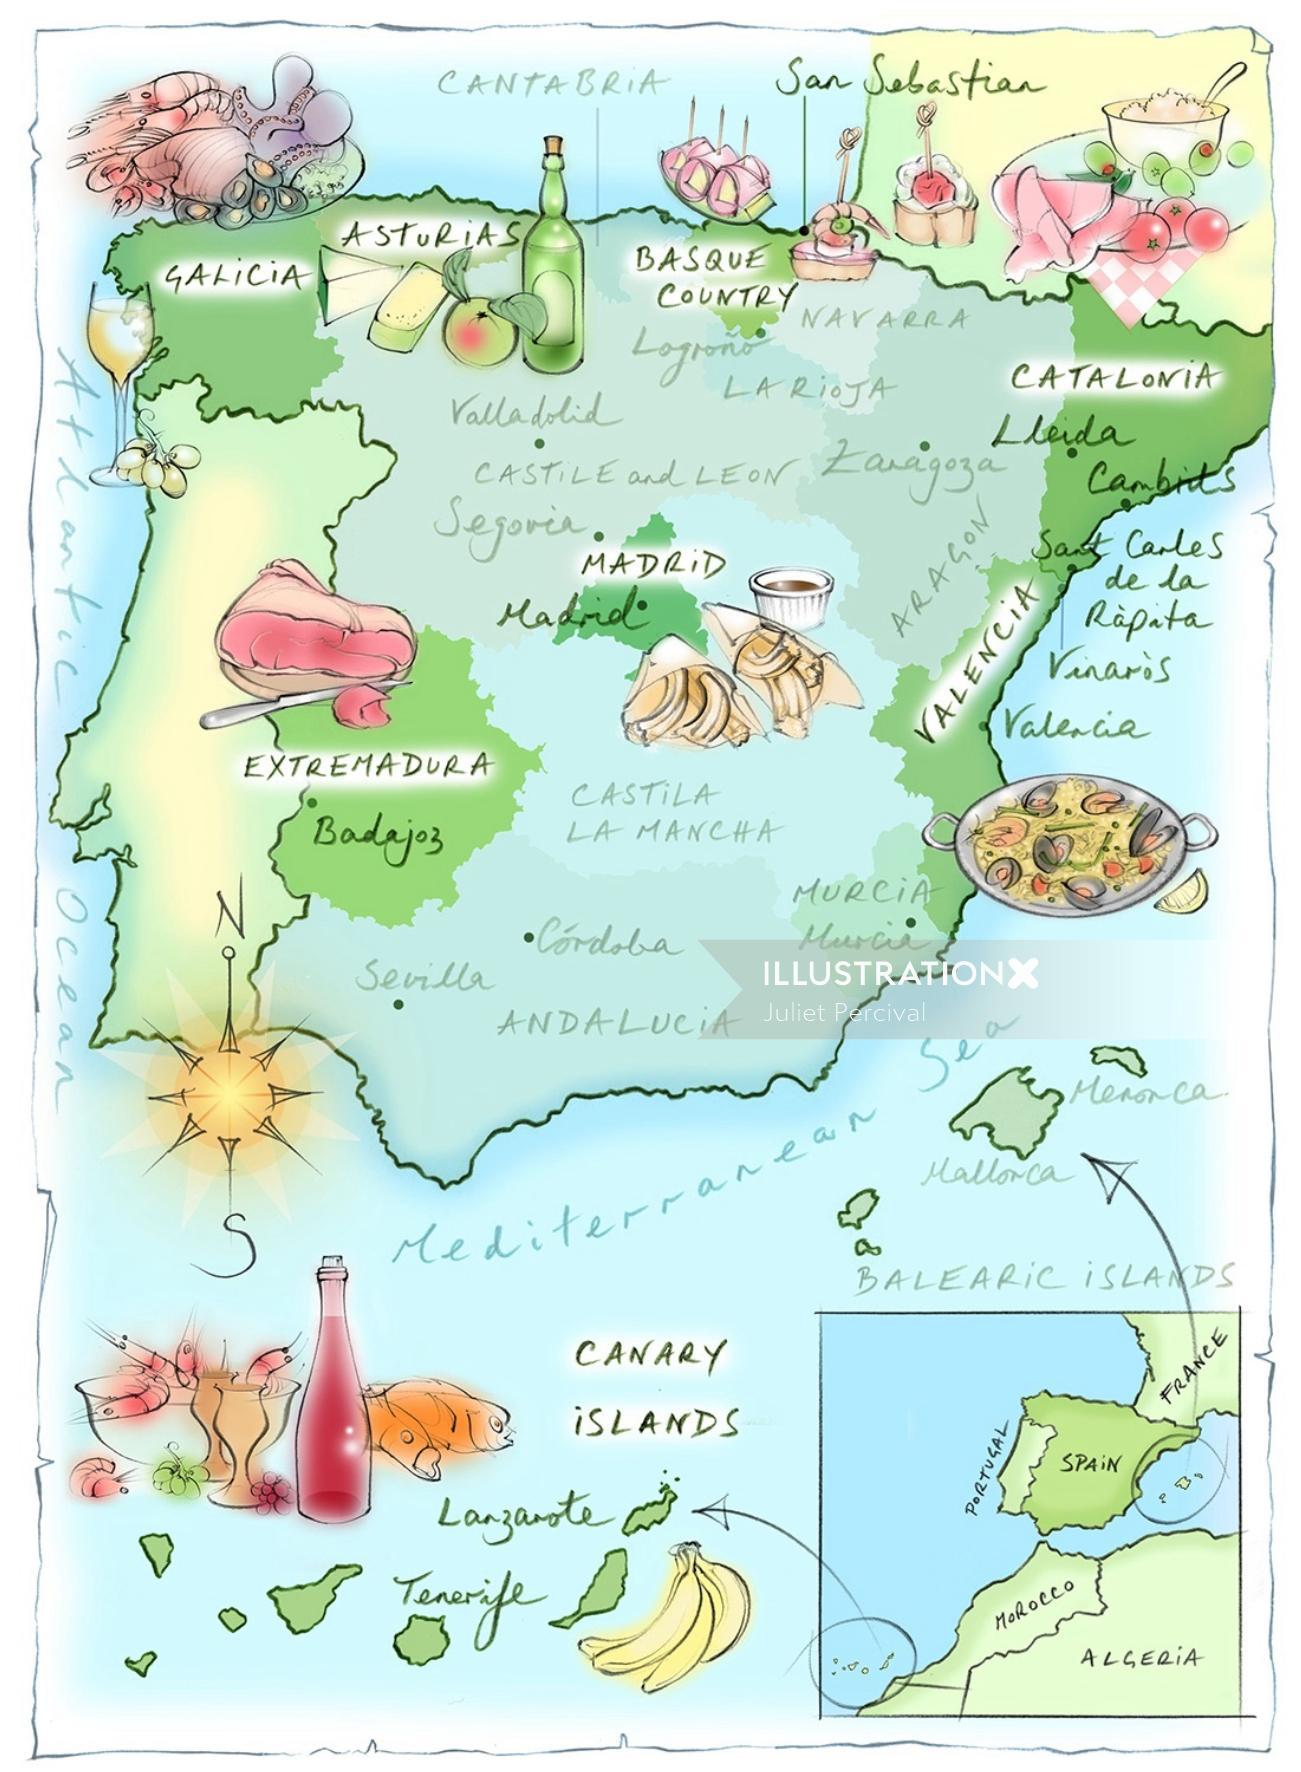 spain map, hand drawn, food, Extremadura, Catalonia, paella, tapas, wine